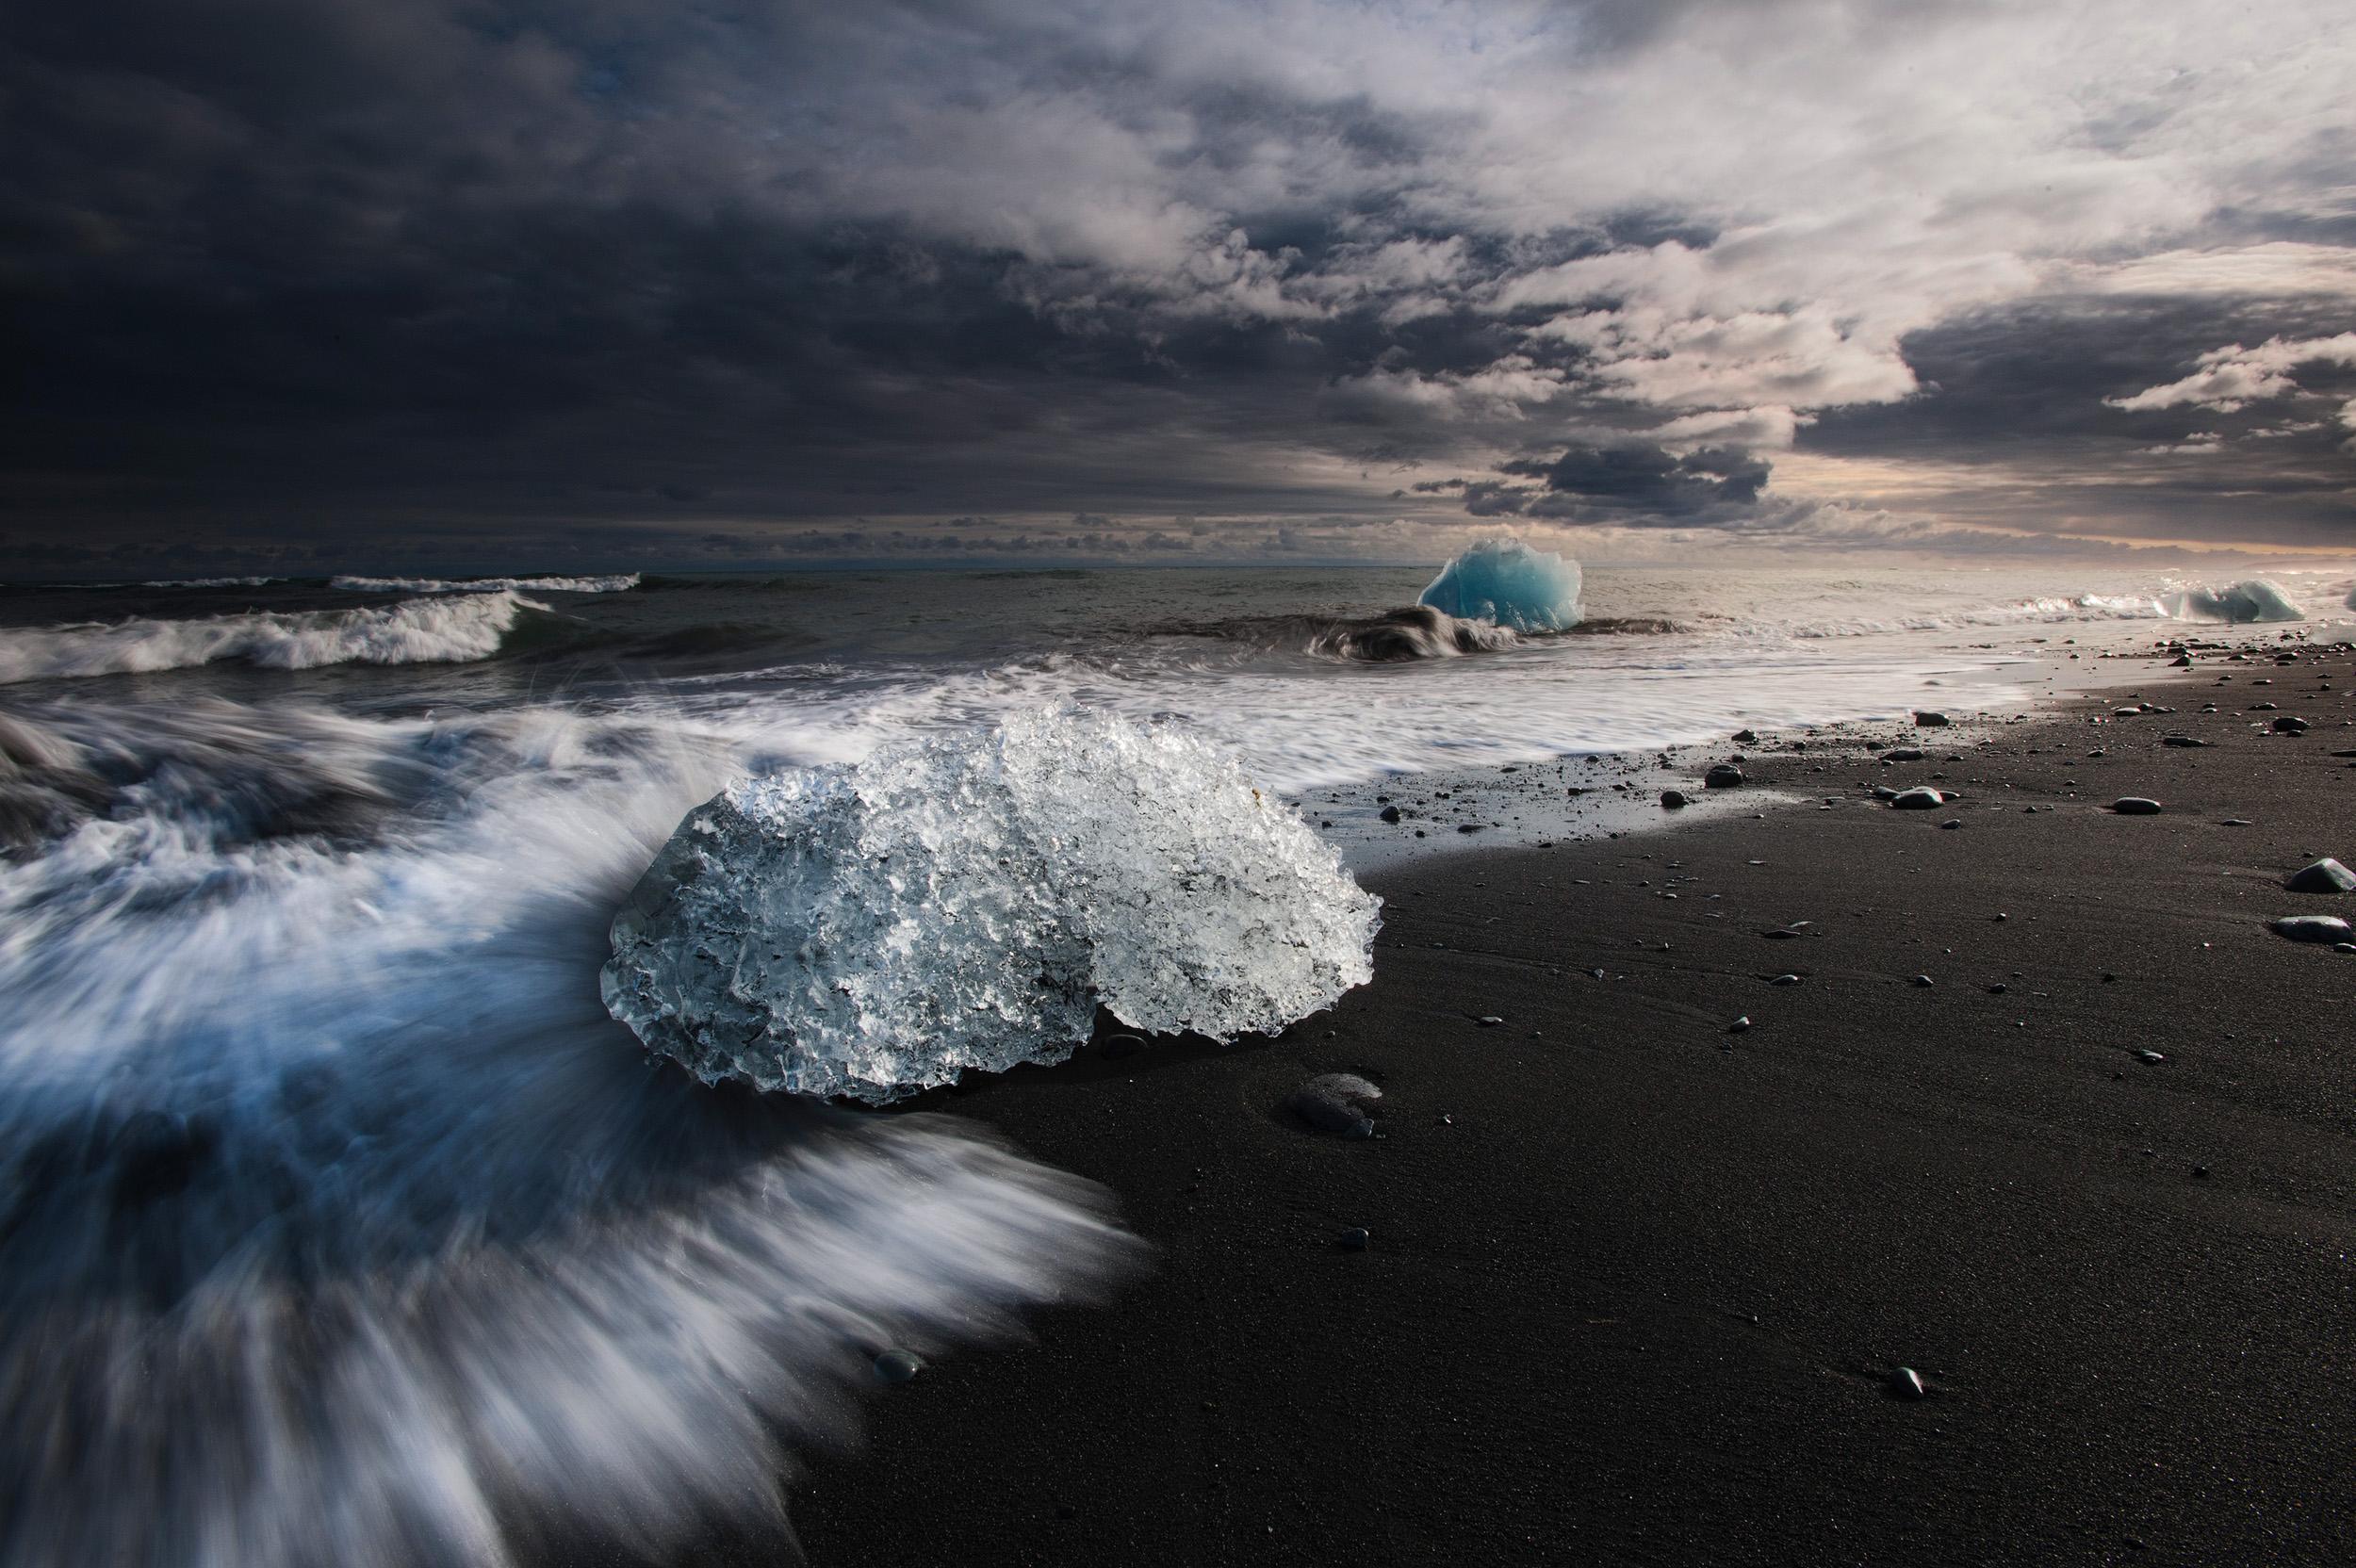 Jokulsarlon Beach  The black sand beach and it's iconic icebergs at Jokulsarlon in south east Iceland